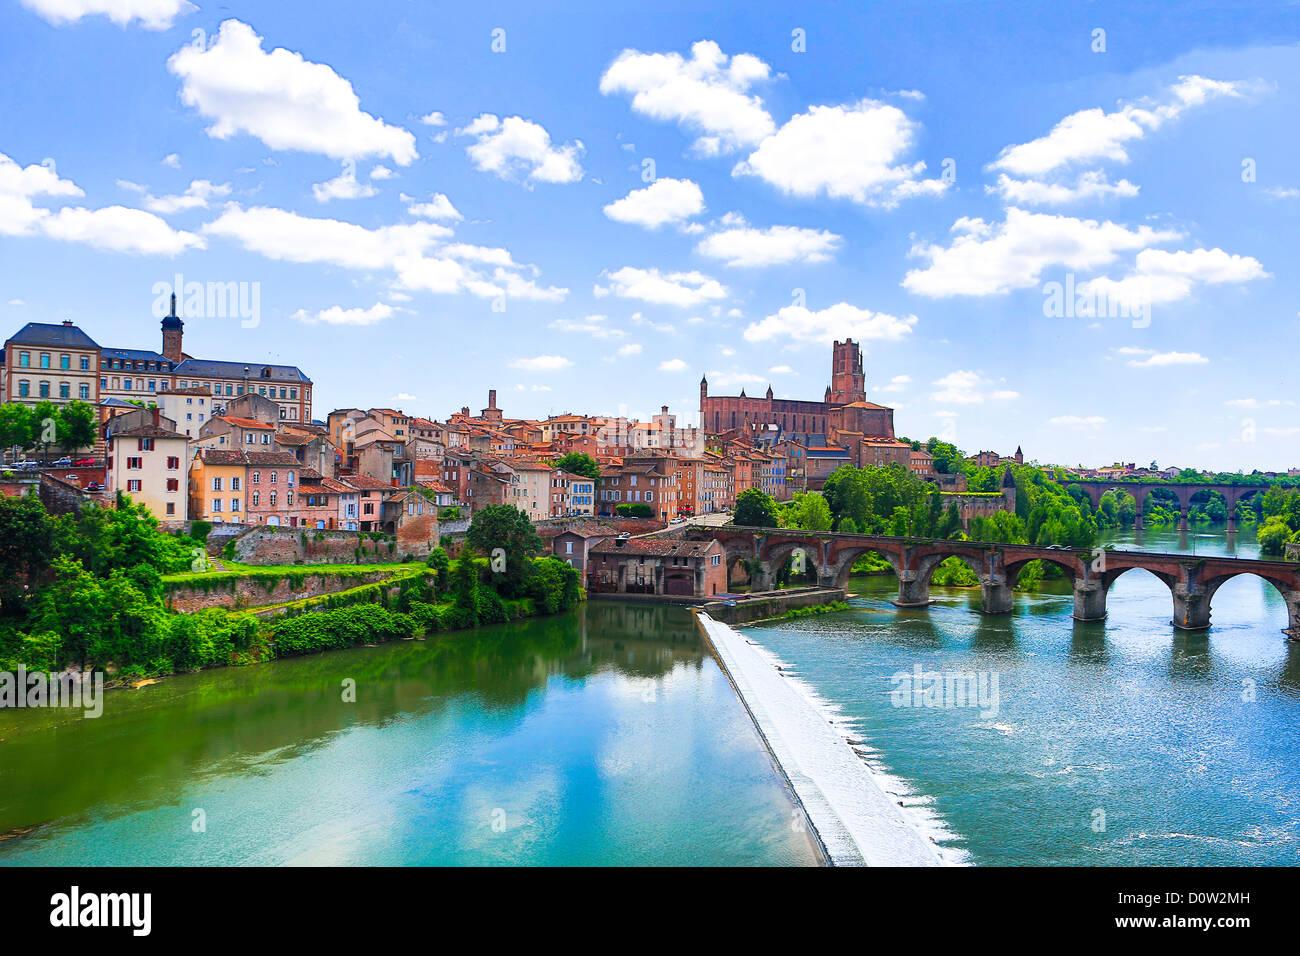 Frankreich, Europa, Reisen, Albi, Saint Cecile, Kathedrale, Welterbe, Brücke, Fluss, Architektur, Brücke, Stockbild